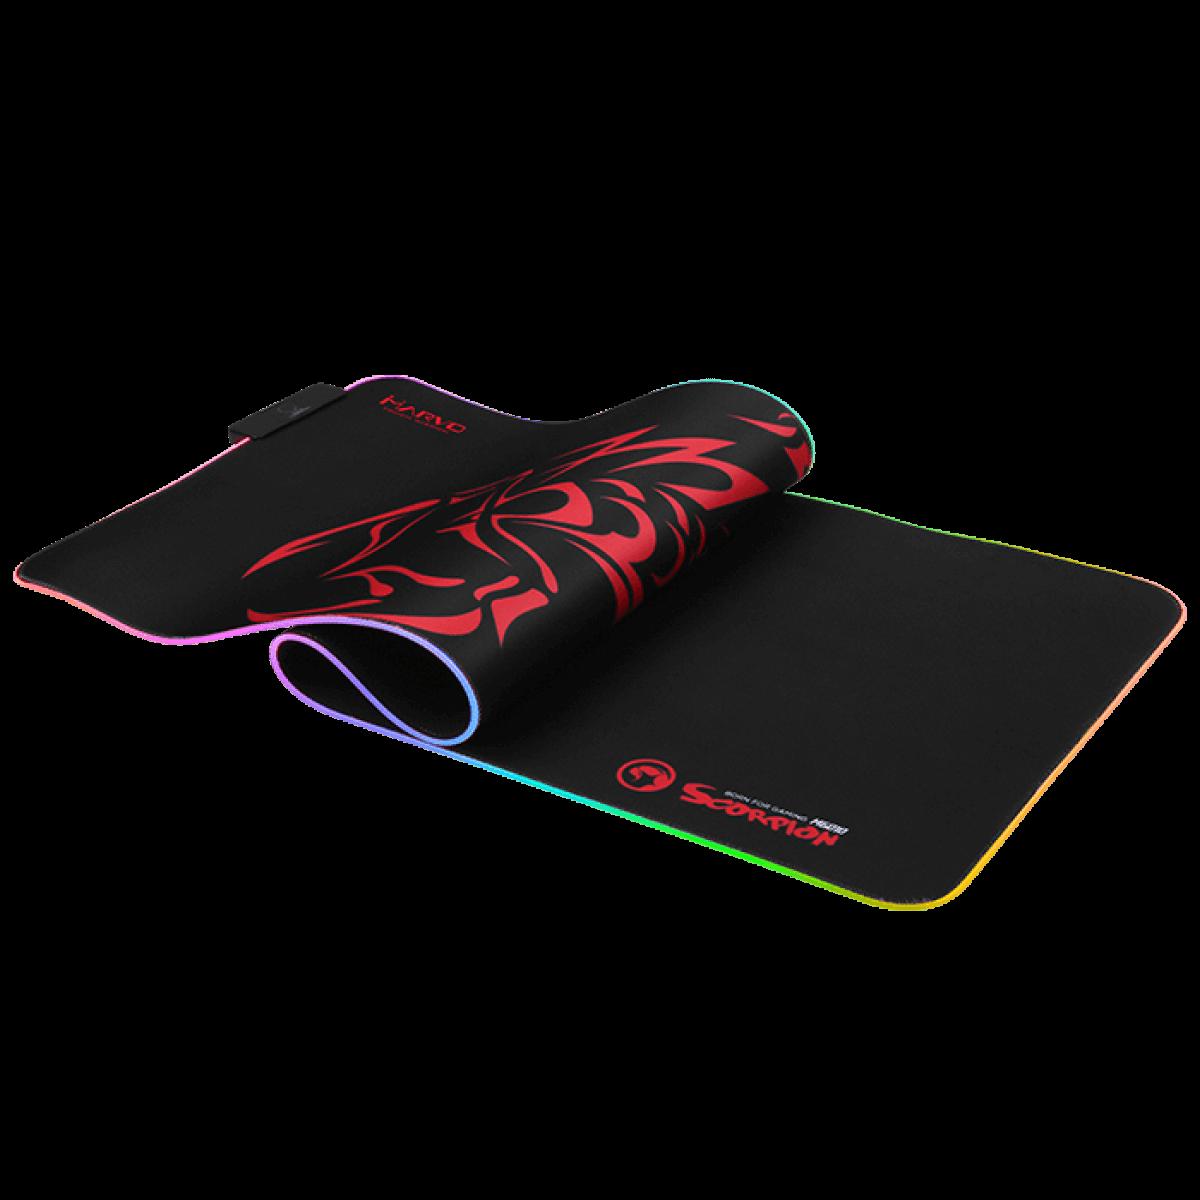 MousePad RGB Marvo Gamer Speed MG010 Lighting 800 x 305 x 3 mm